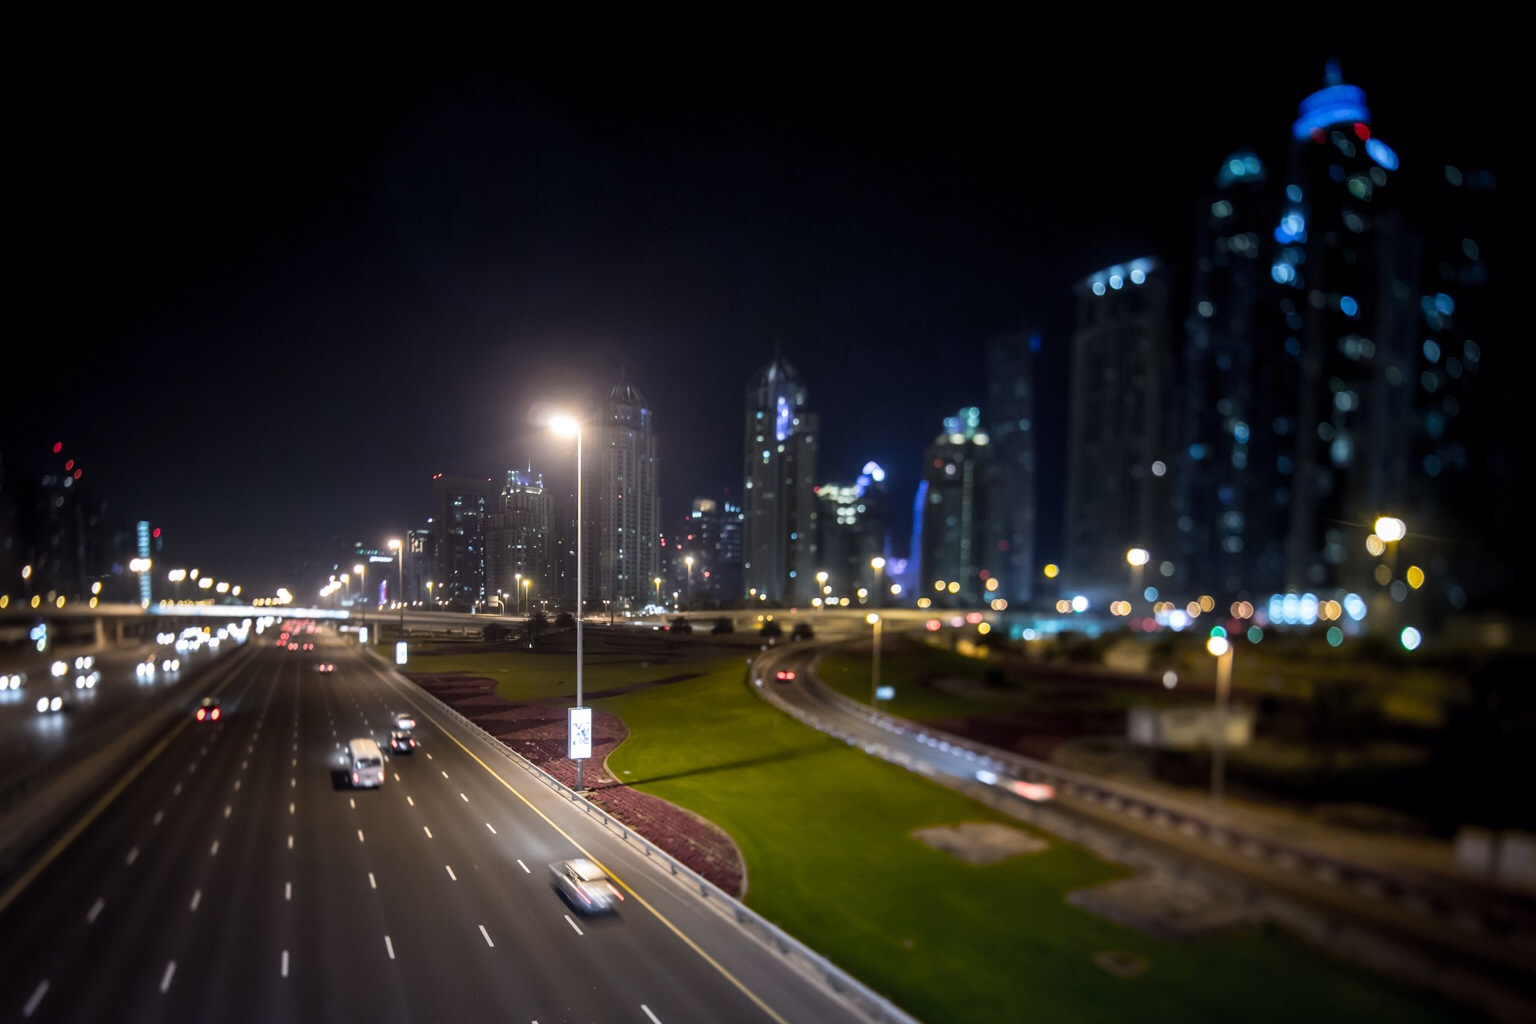 Sheikh Zayed road passing by the Dubai Marina